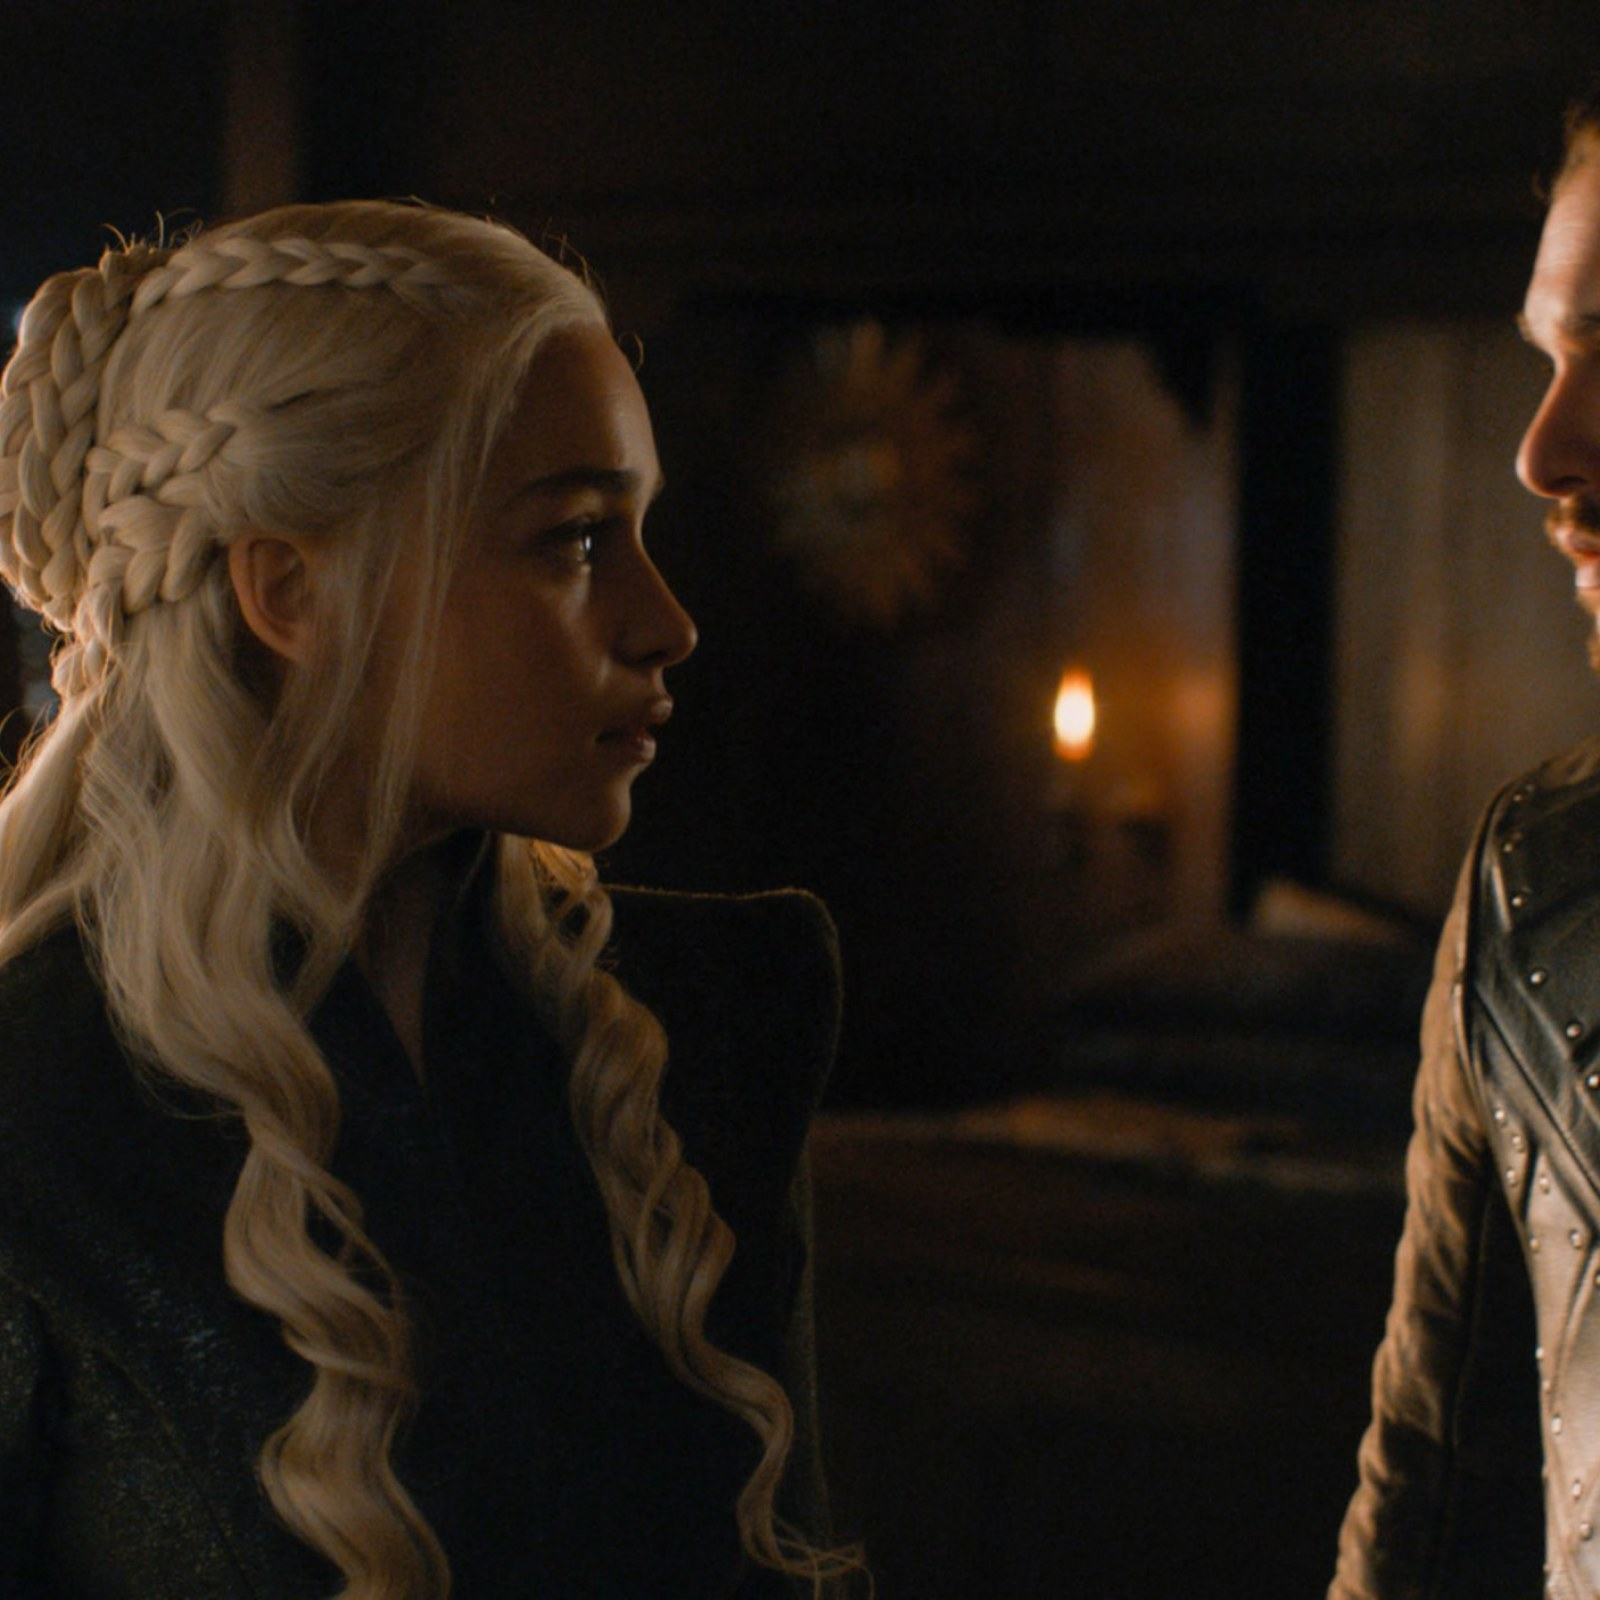 jon snow dating daenerys